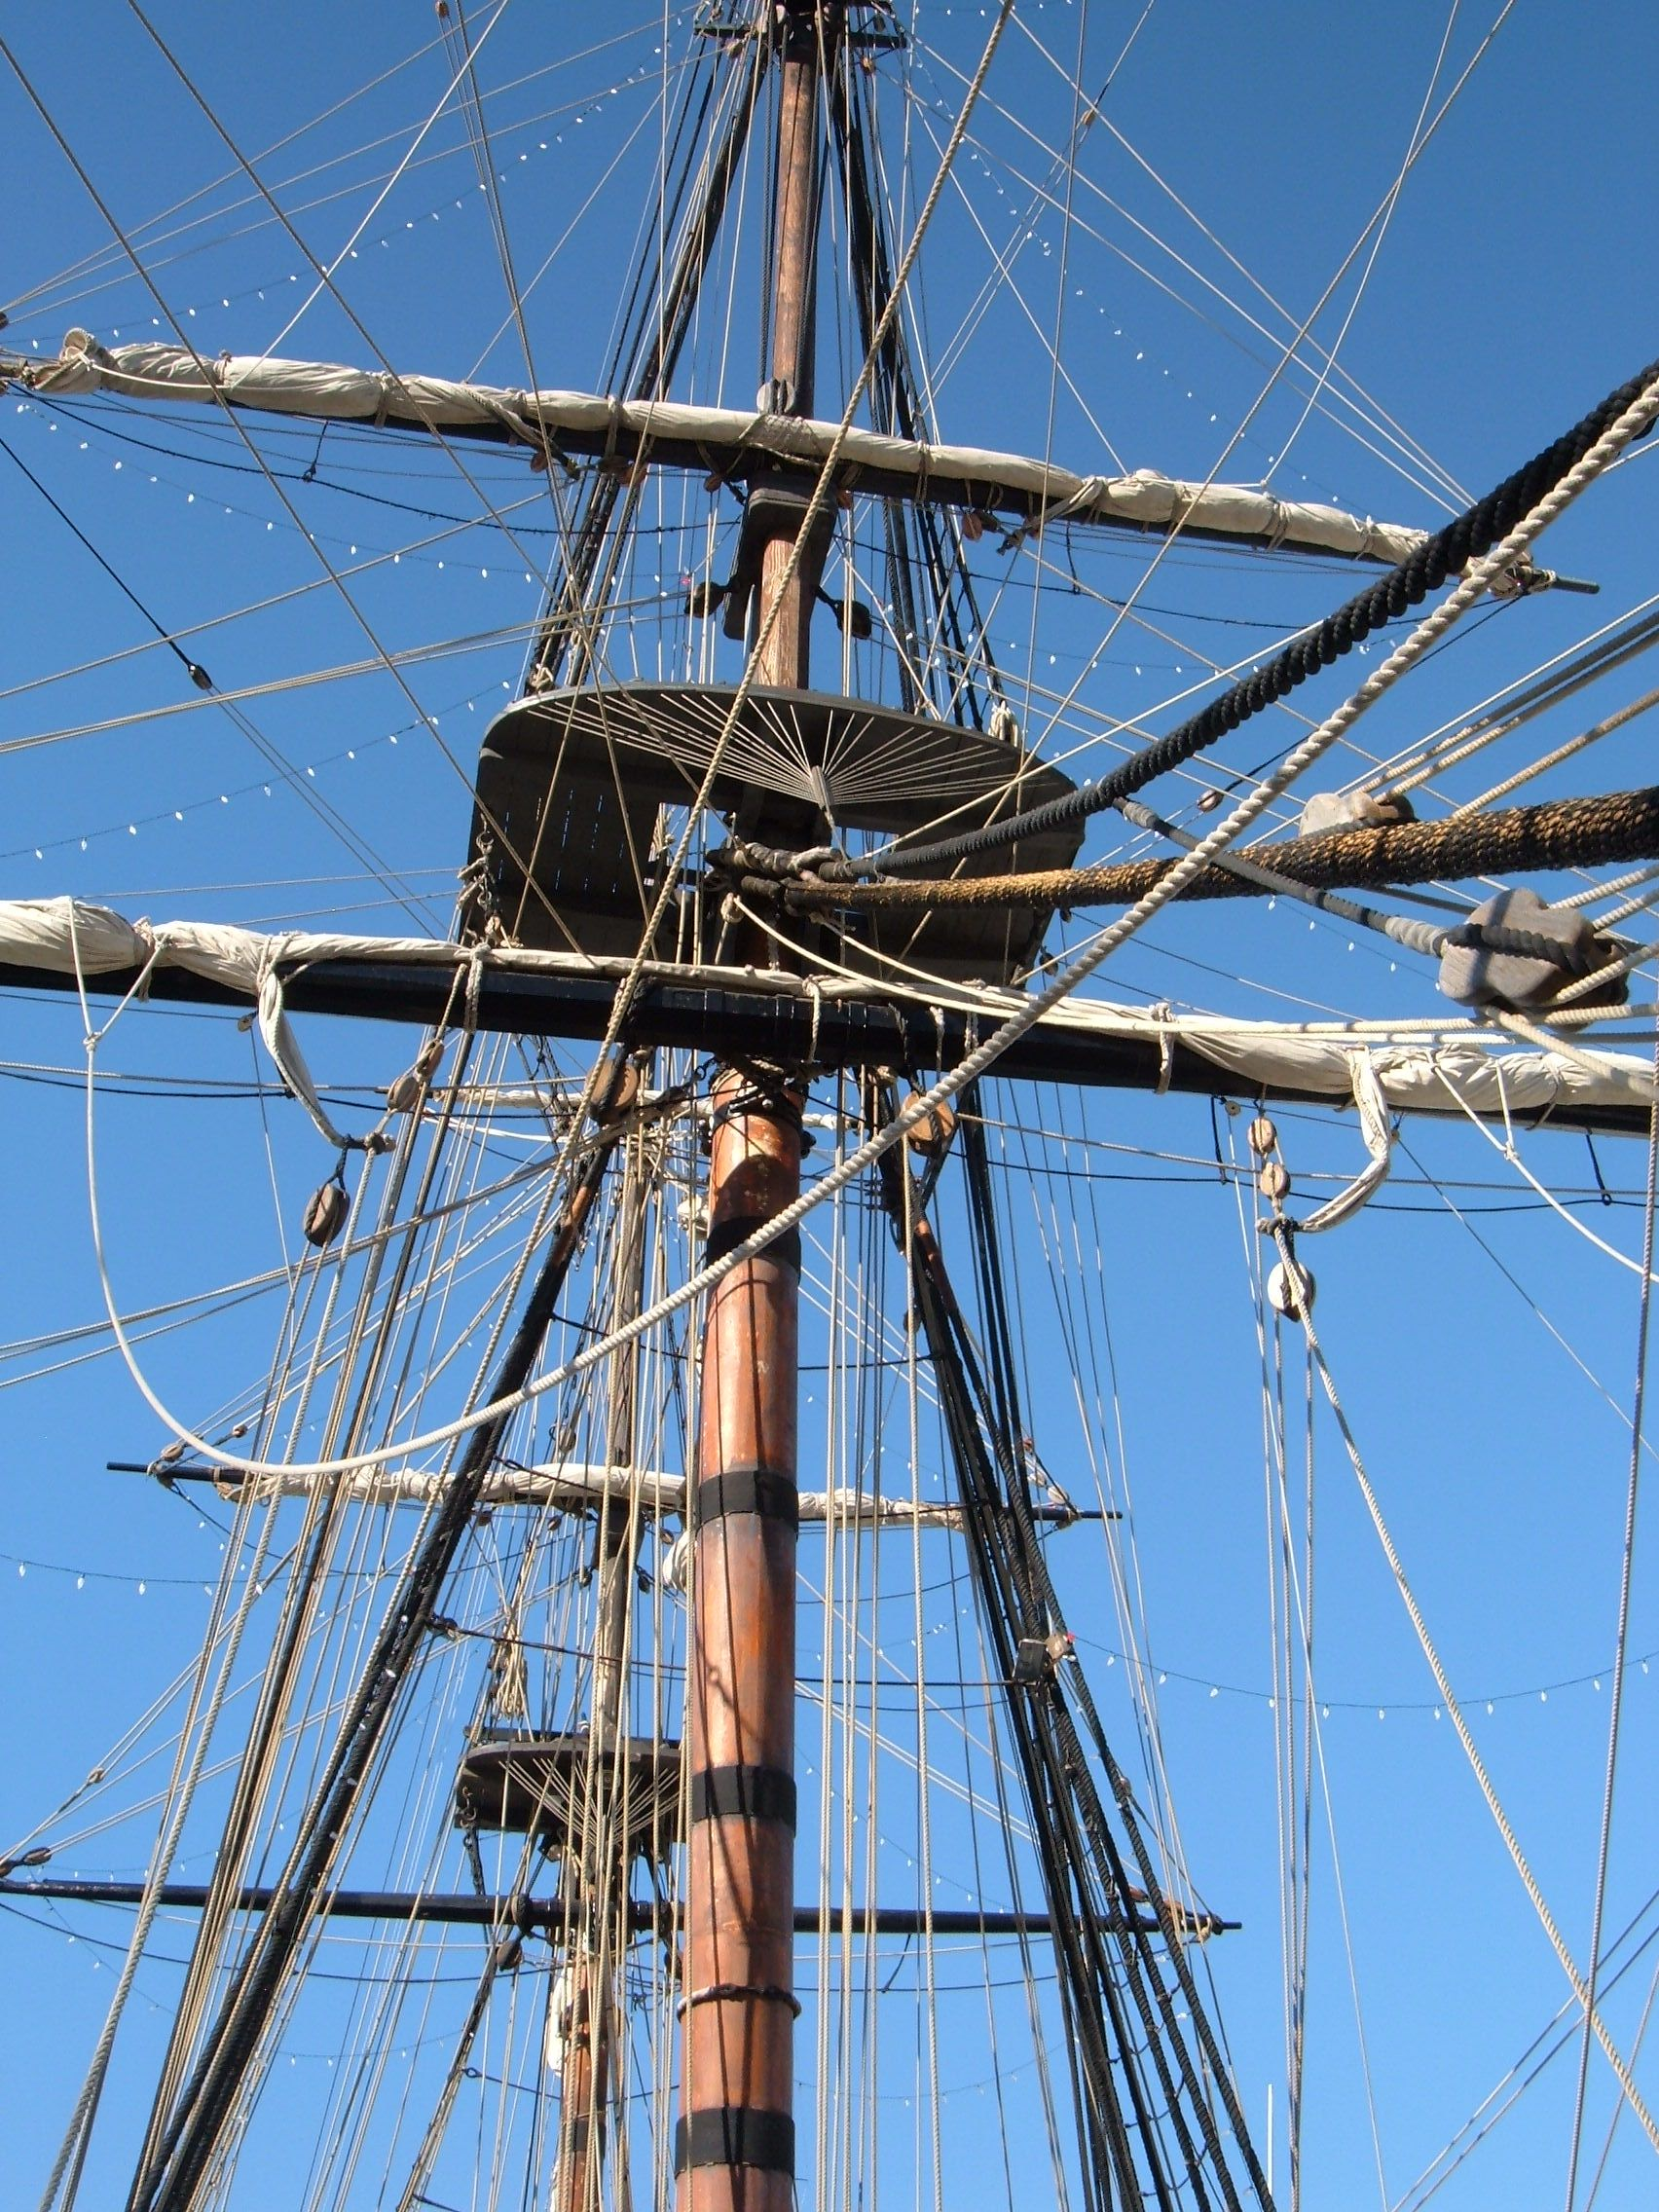 Filehms surprise replica ship mast 1g wikimedia commons filehms surprise replica ship mast 1g sciox Gallery